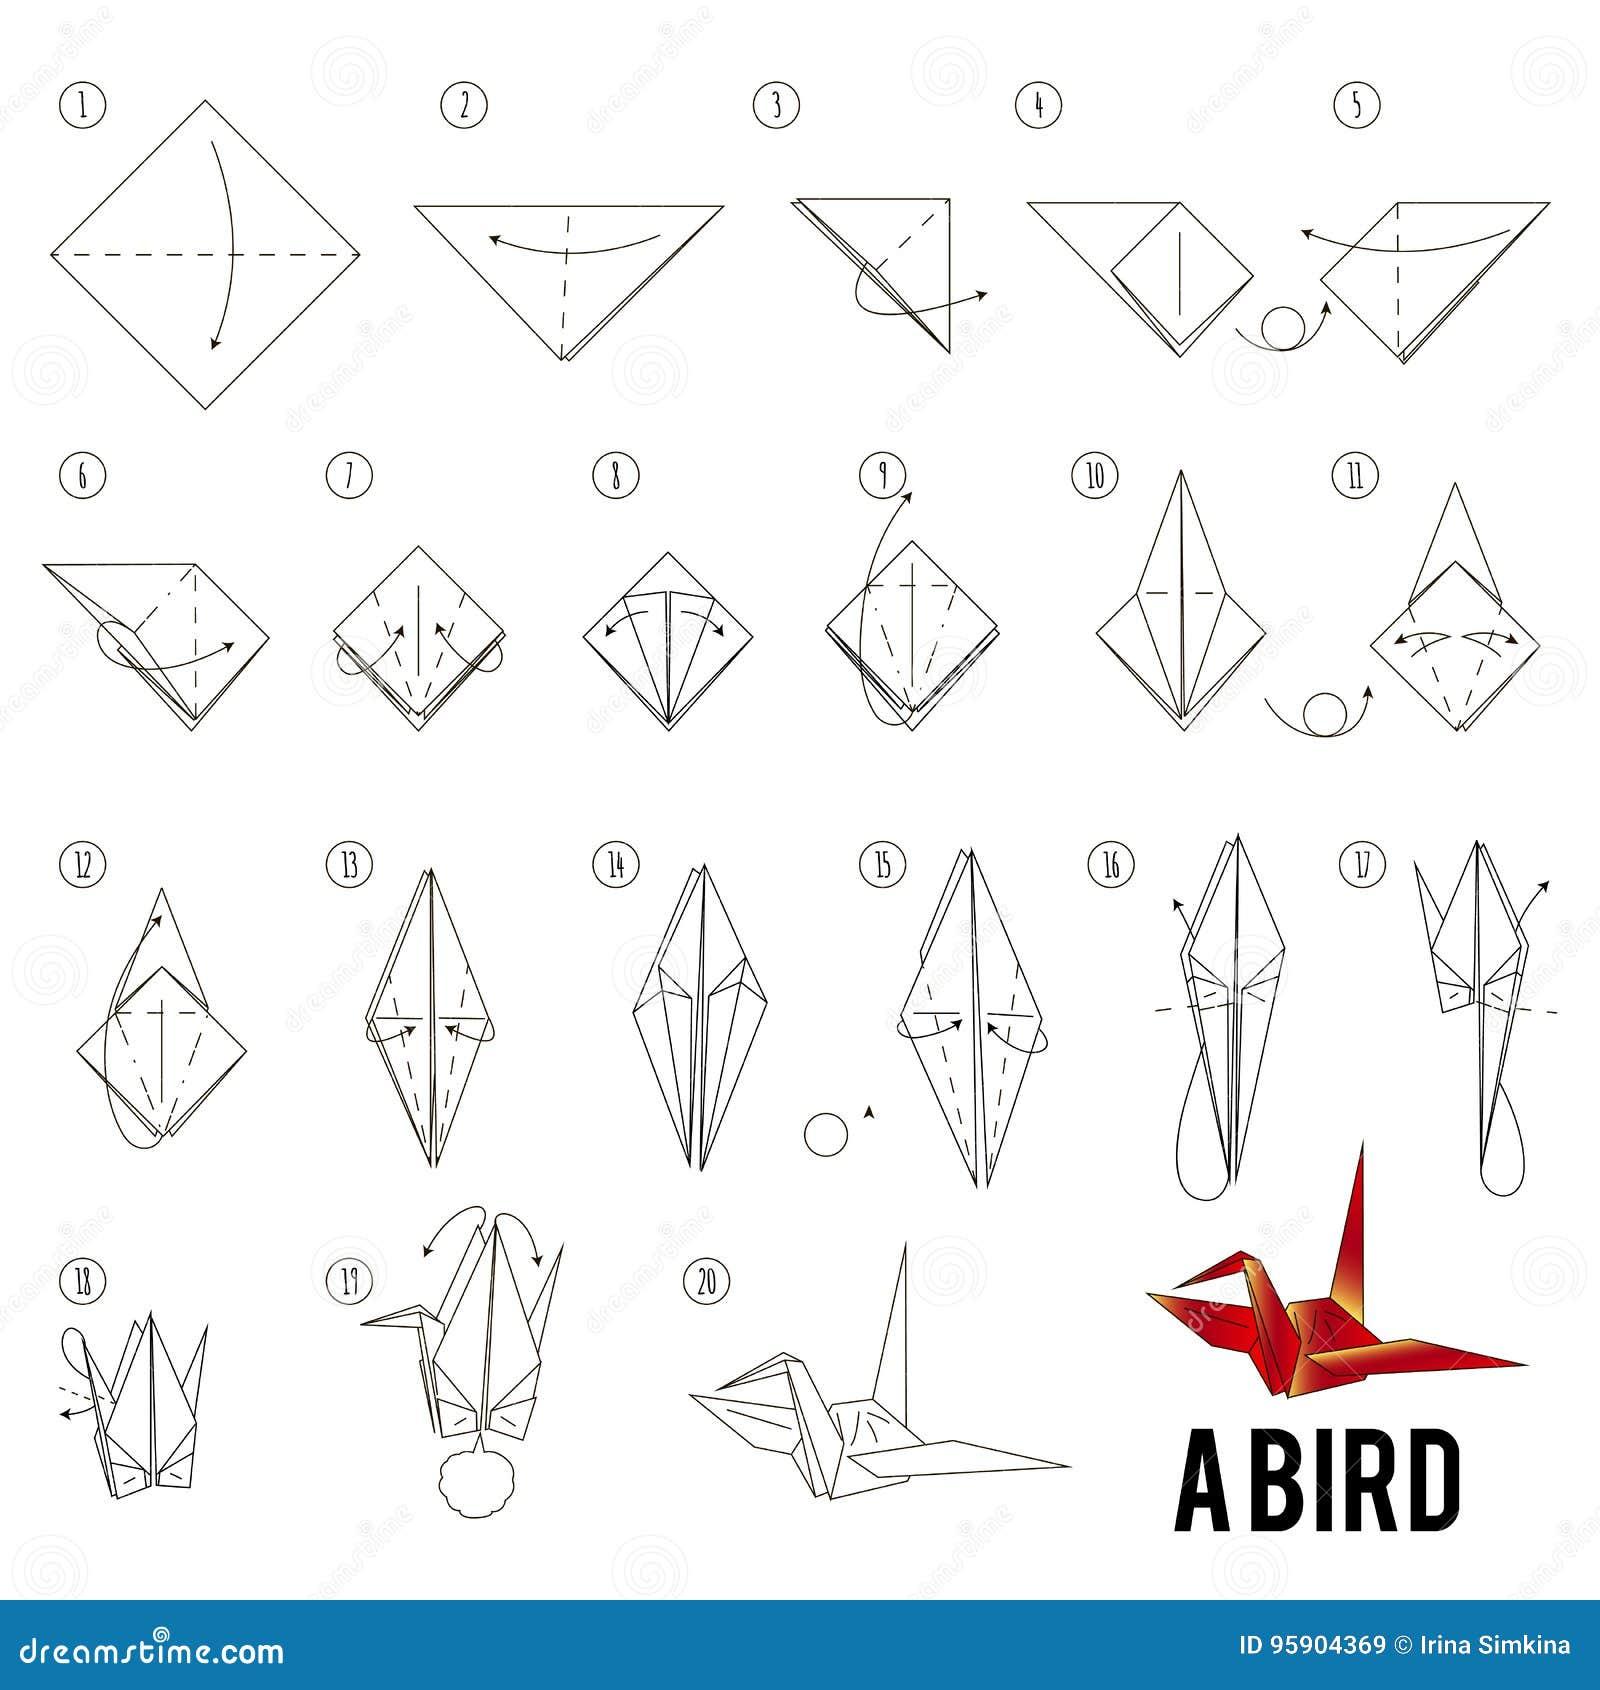 Épinglé par DIY by Anna Craft sur ORIGAMI TUTORIAL for kids ORIGAMI STEP BY STEP  instructions | Oiseau origami, Origami simple, Instructions d'origami | 1390x1300